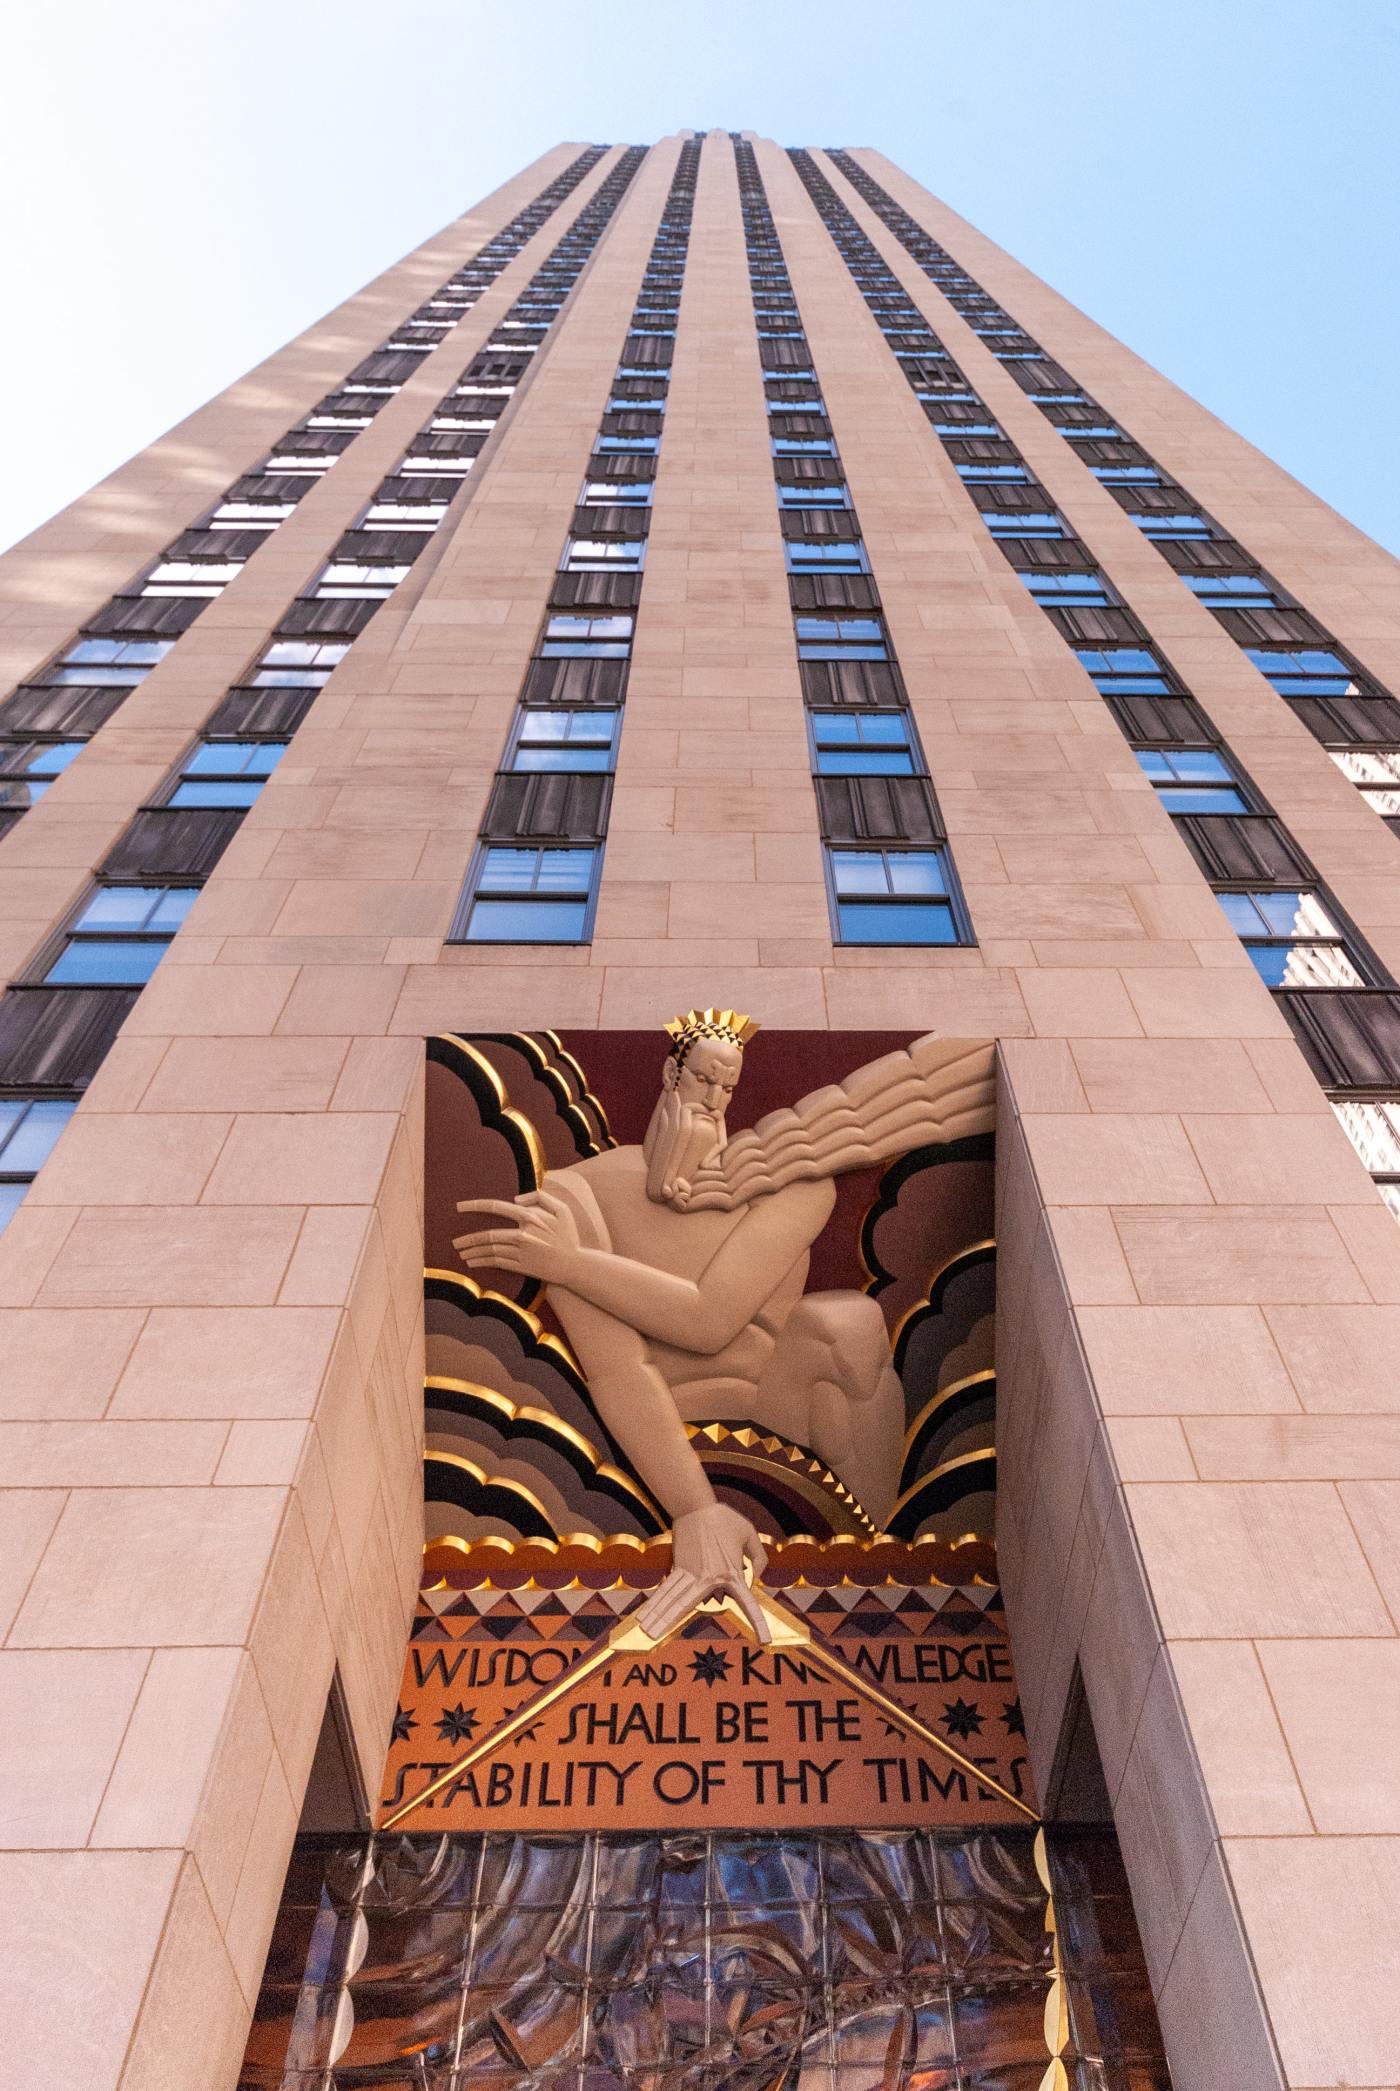 Wisdom writing on a building